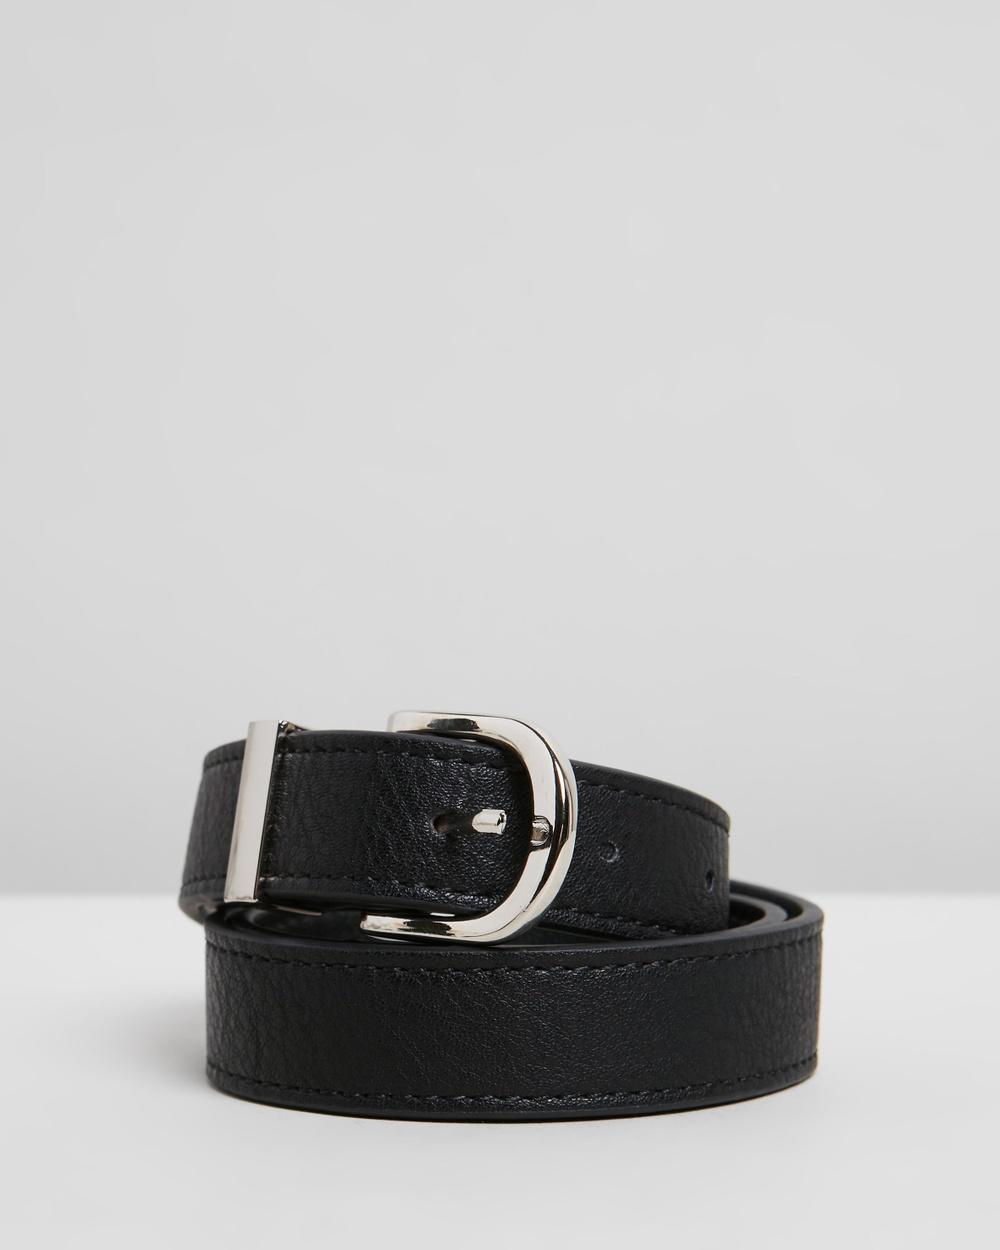 PETA AND JAIN Kendrick Belt Belts Black PU & Silver